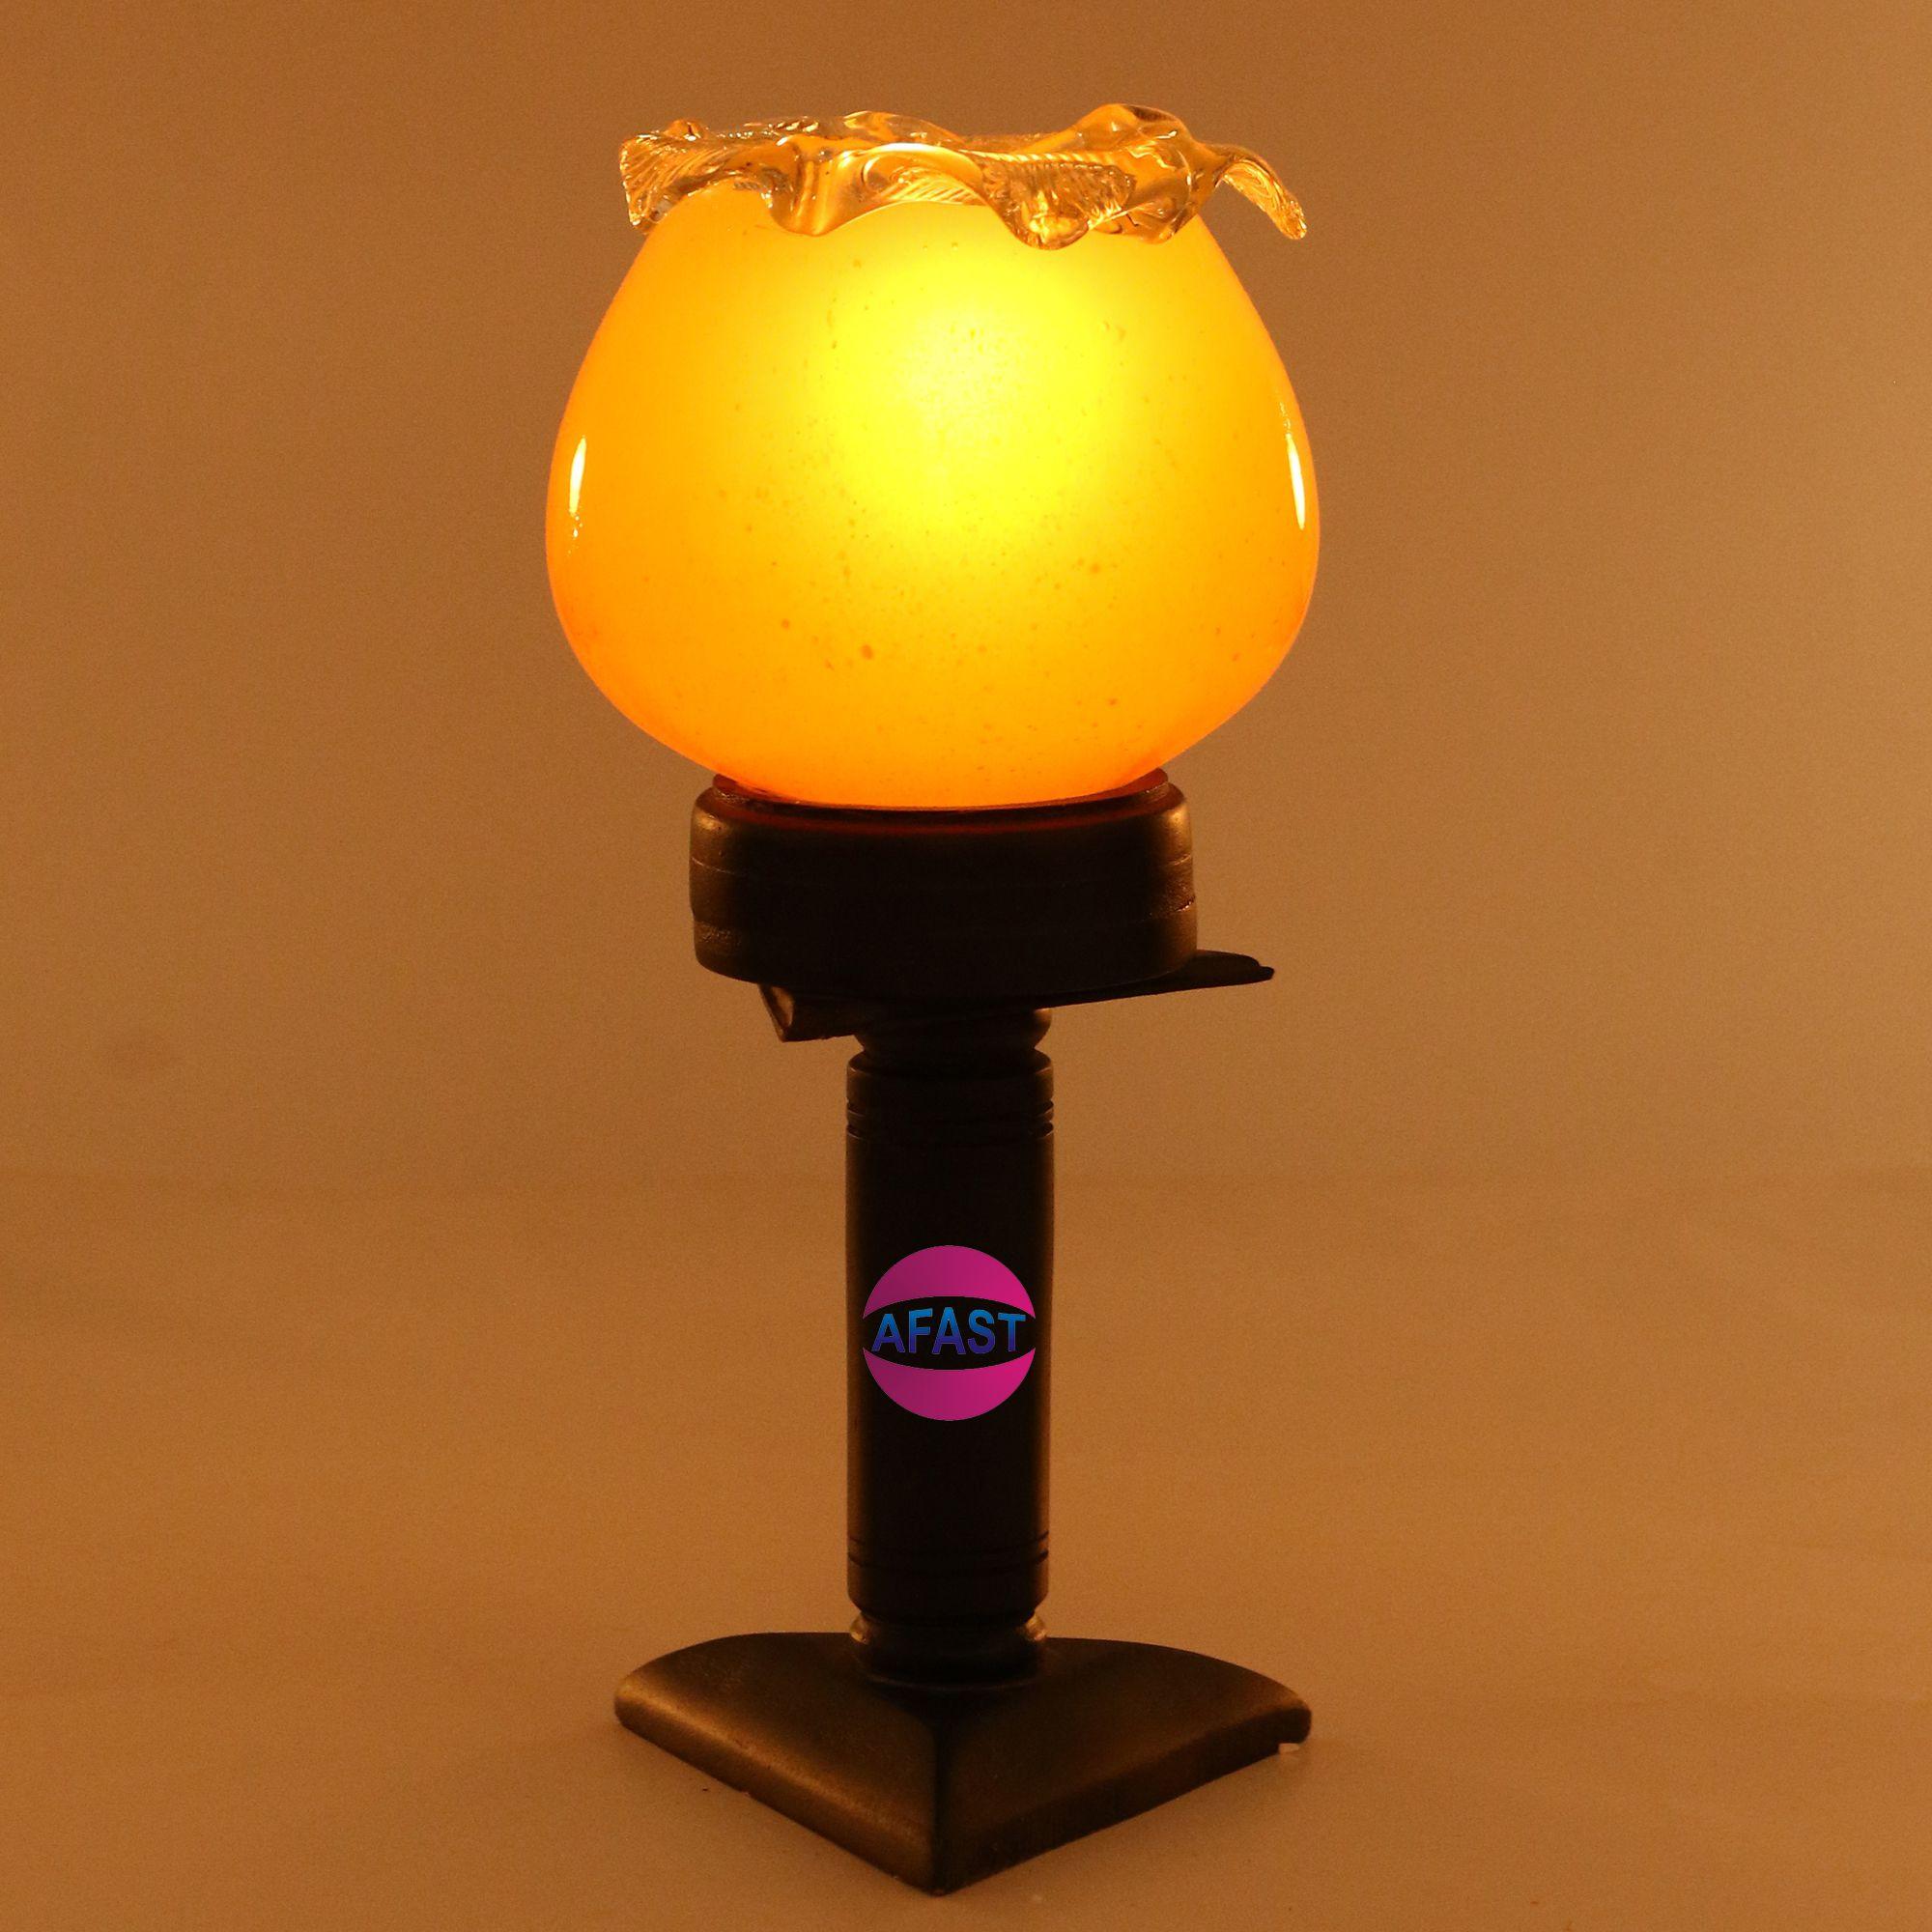 AFAST Yellow LED Tea Light - Pack of 1